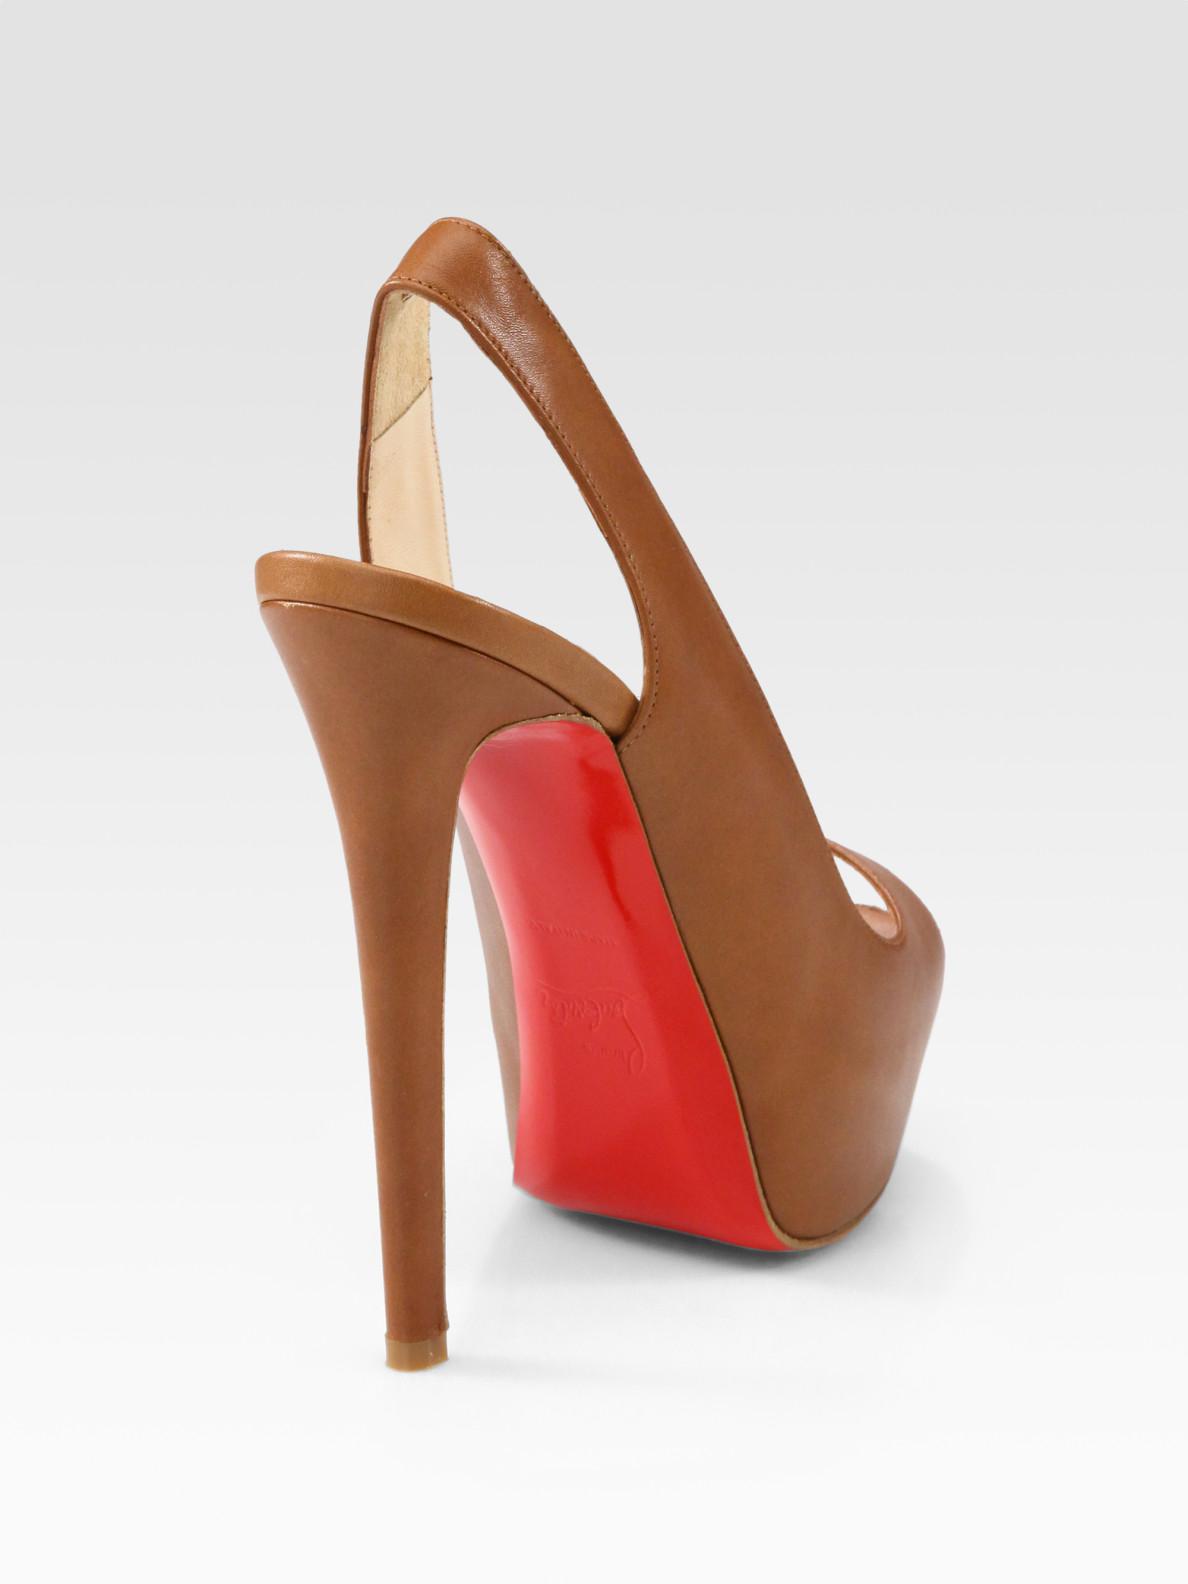 Peony Design ? christian louboutin cheyenne leather peep toe ...